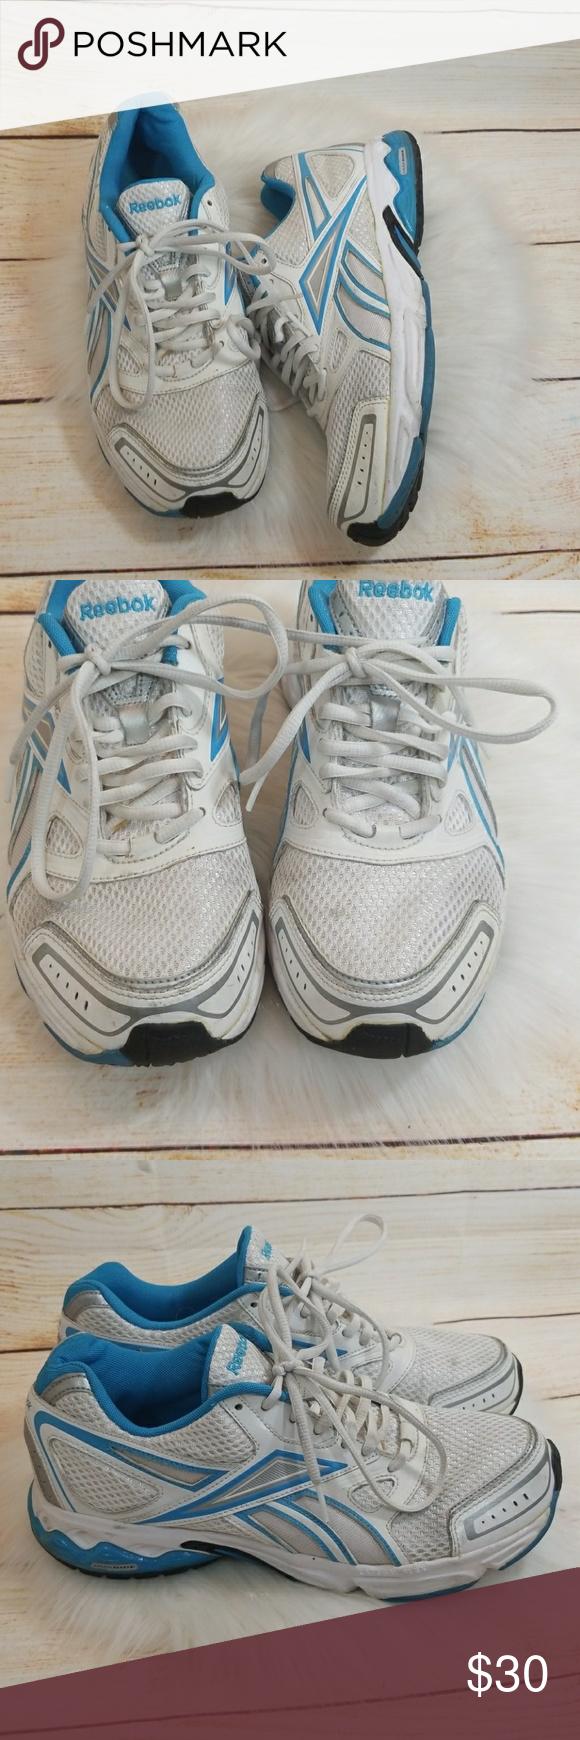 Reebok DMX RIDE running workout shoes